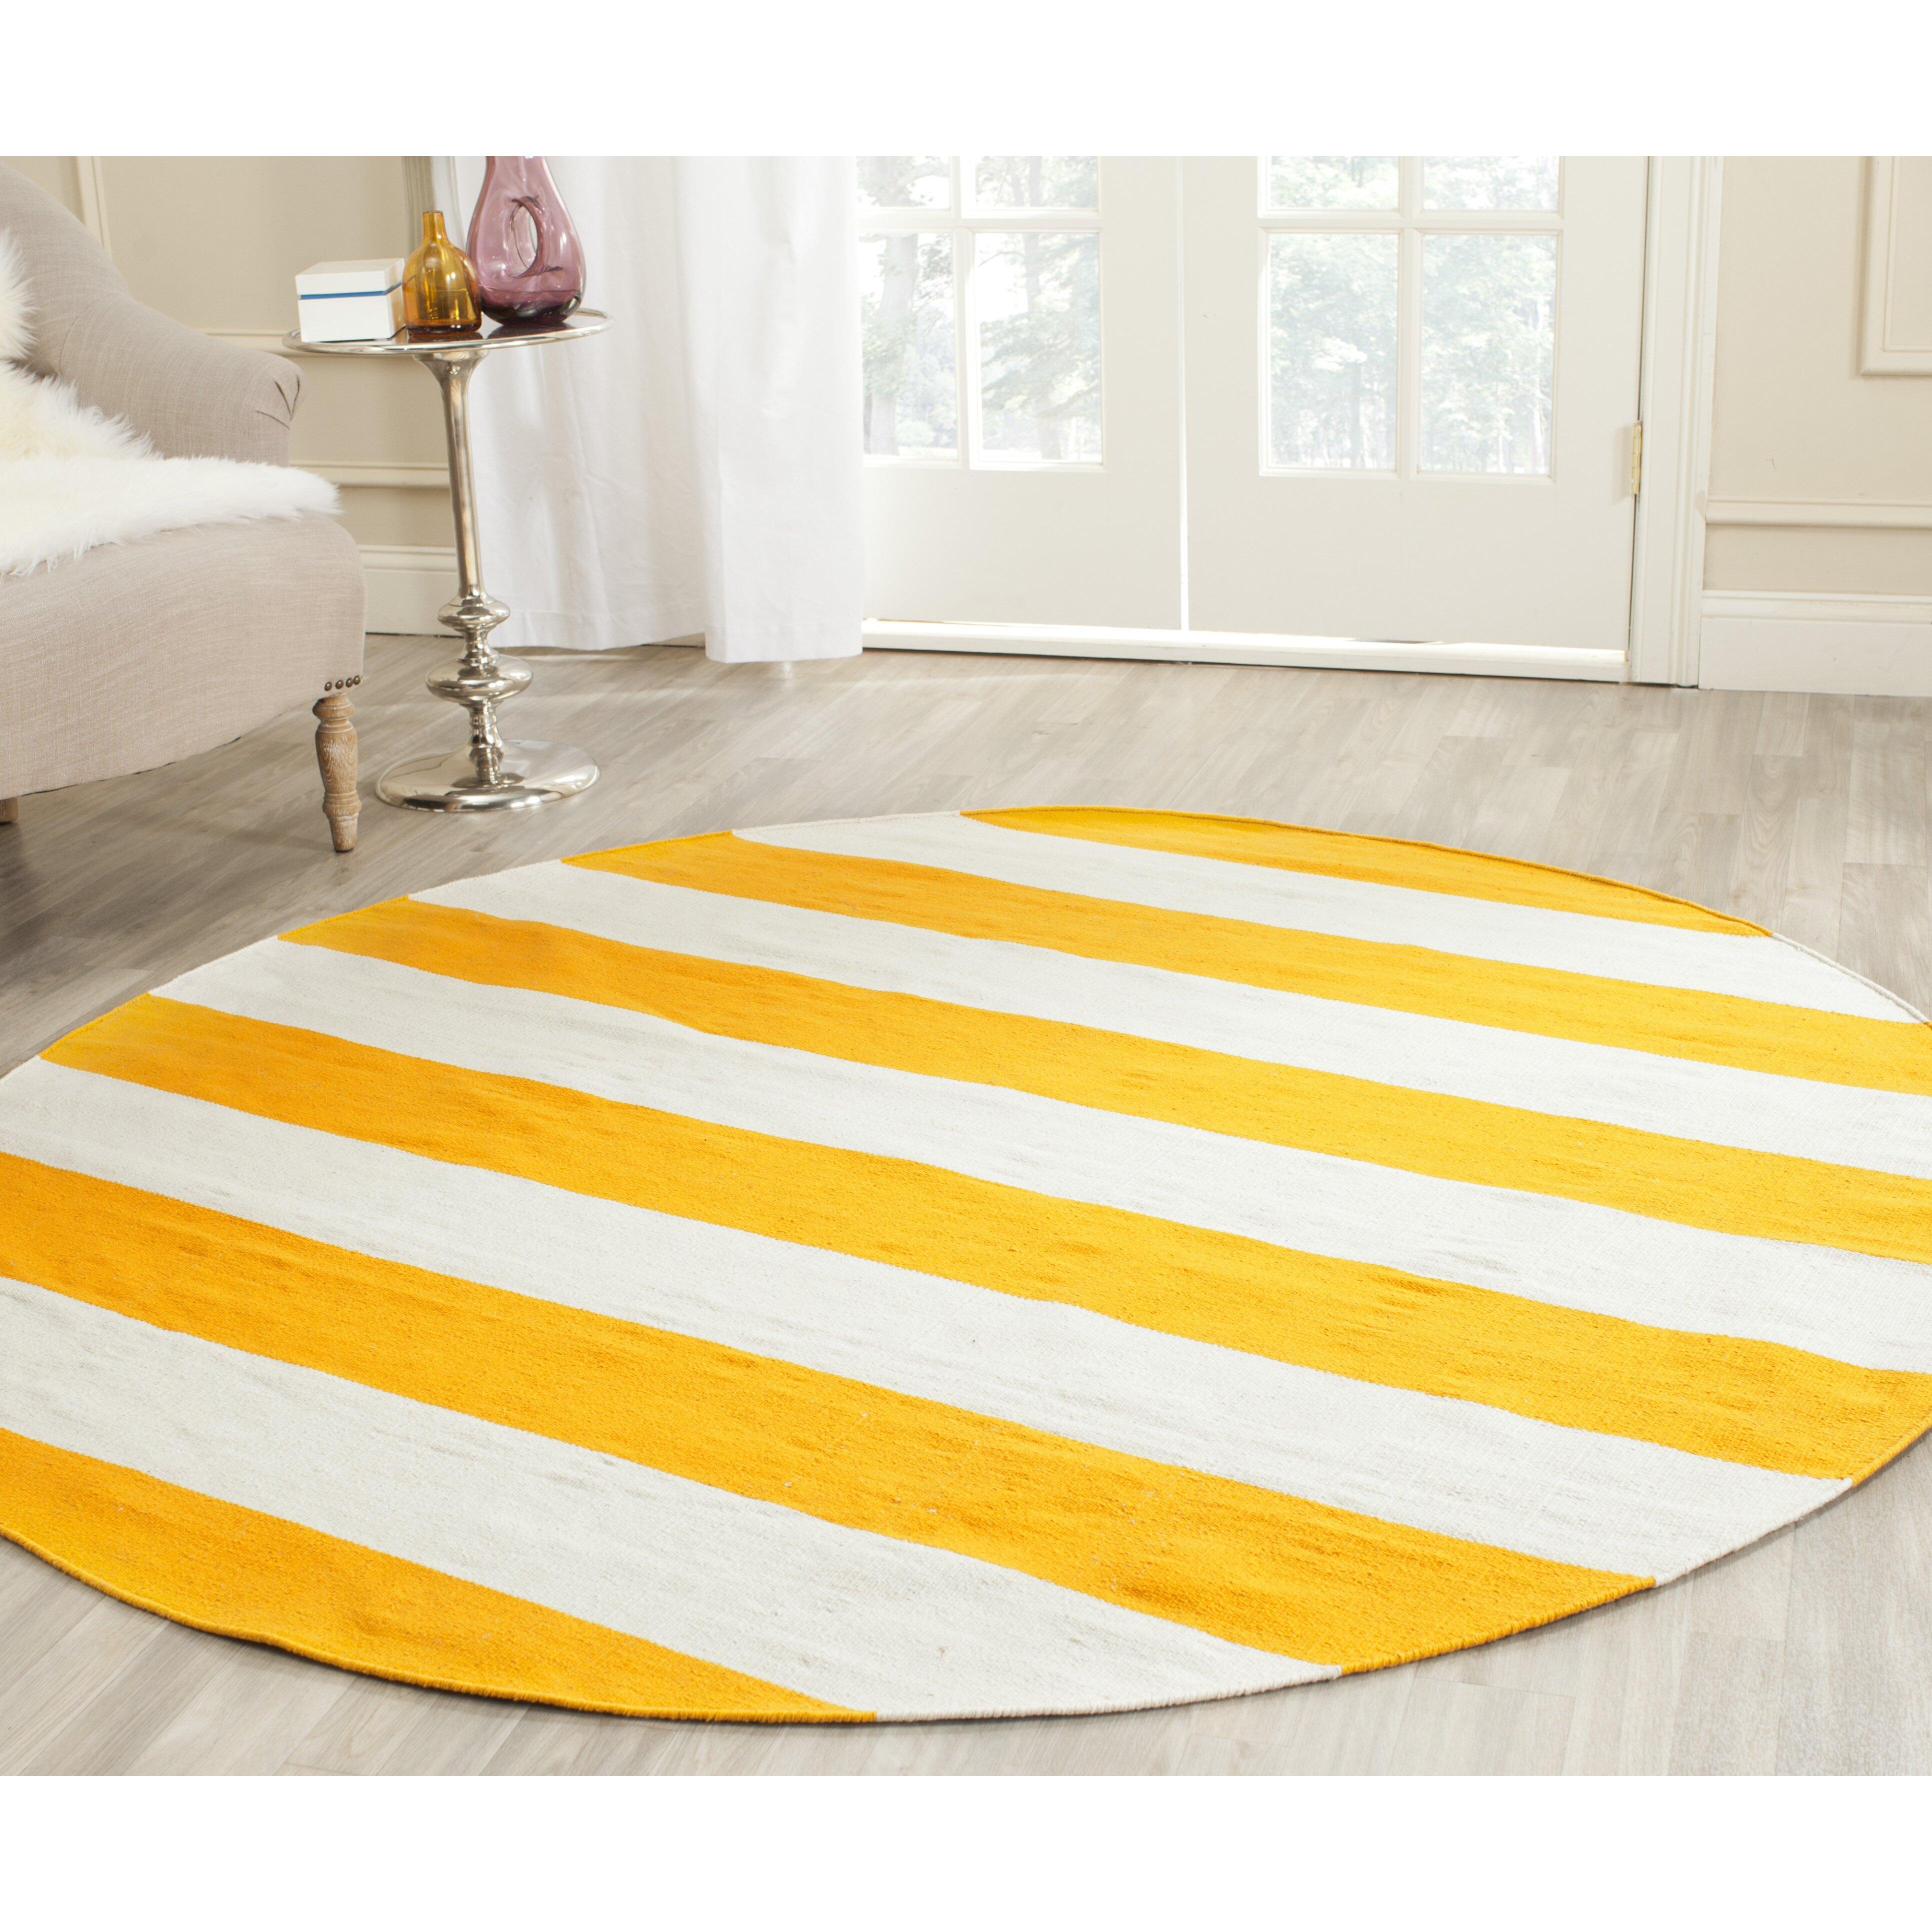 viv rae ike hand woven yellow white area rug reviews. Black Bedroom Furniture Sets. Home Design Ideas